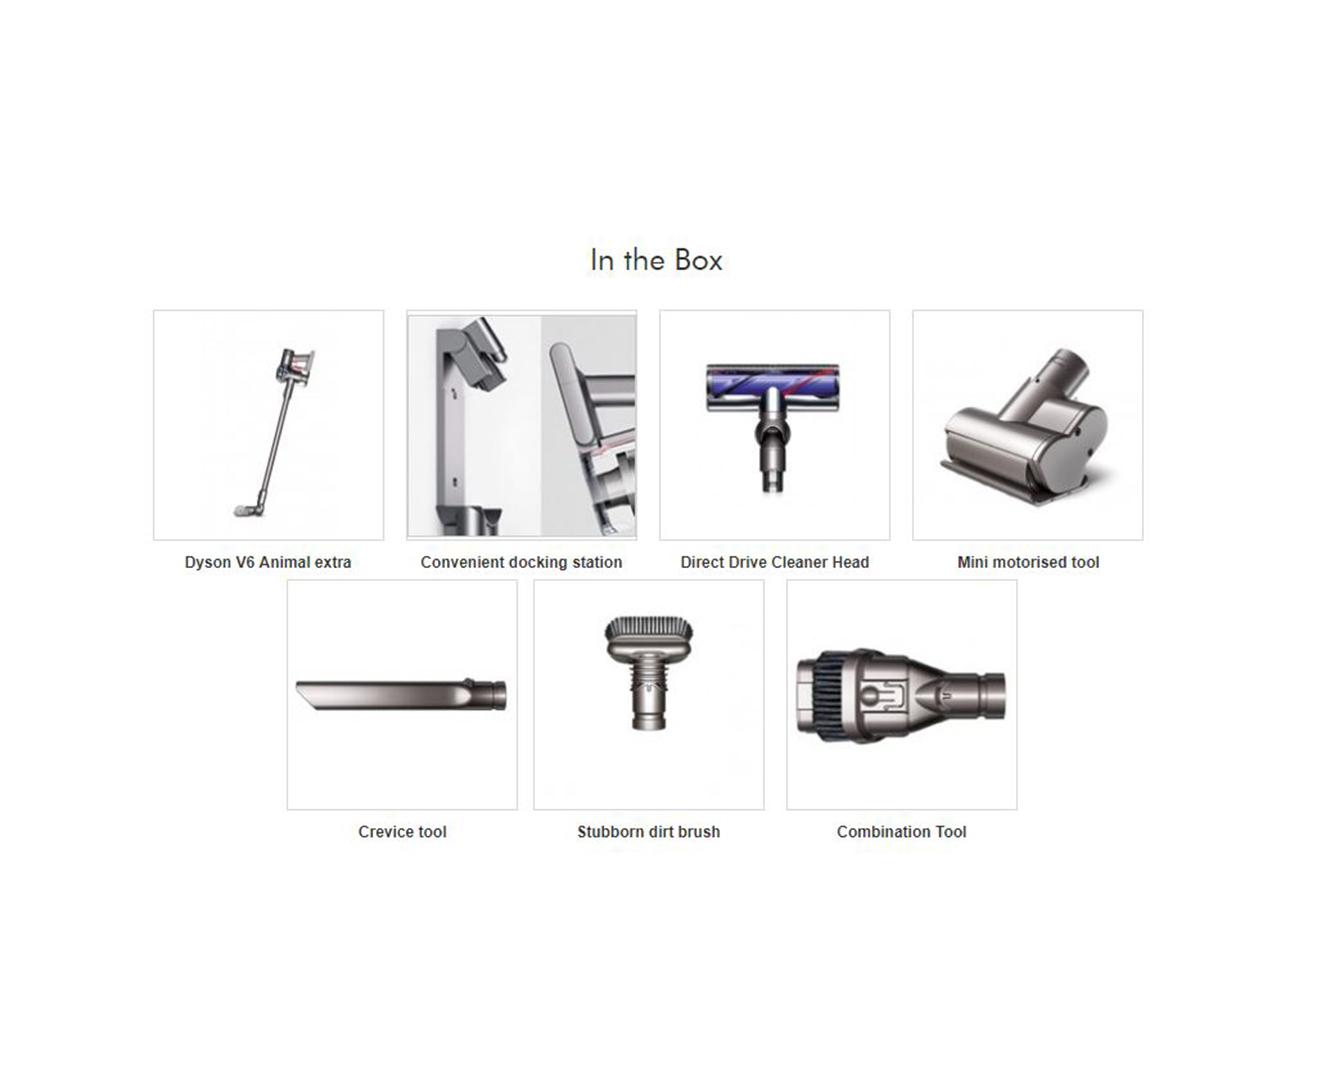 Dyson V6 Animal Extra Cordless Handstick Vacuum Cleaner